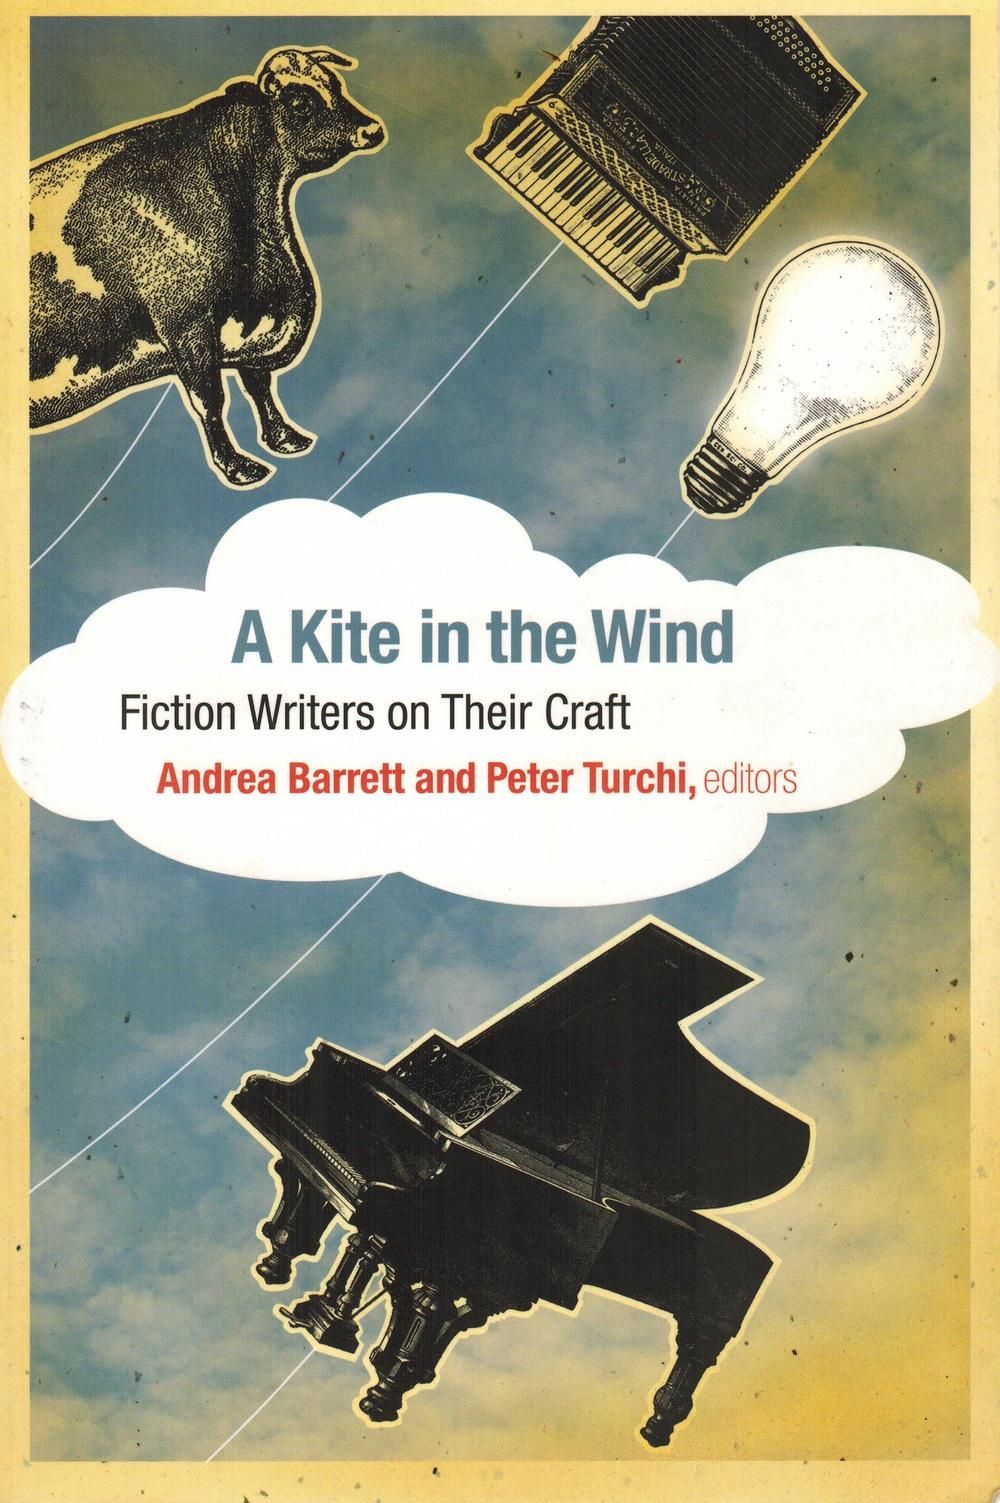 KiteCover.jpg